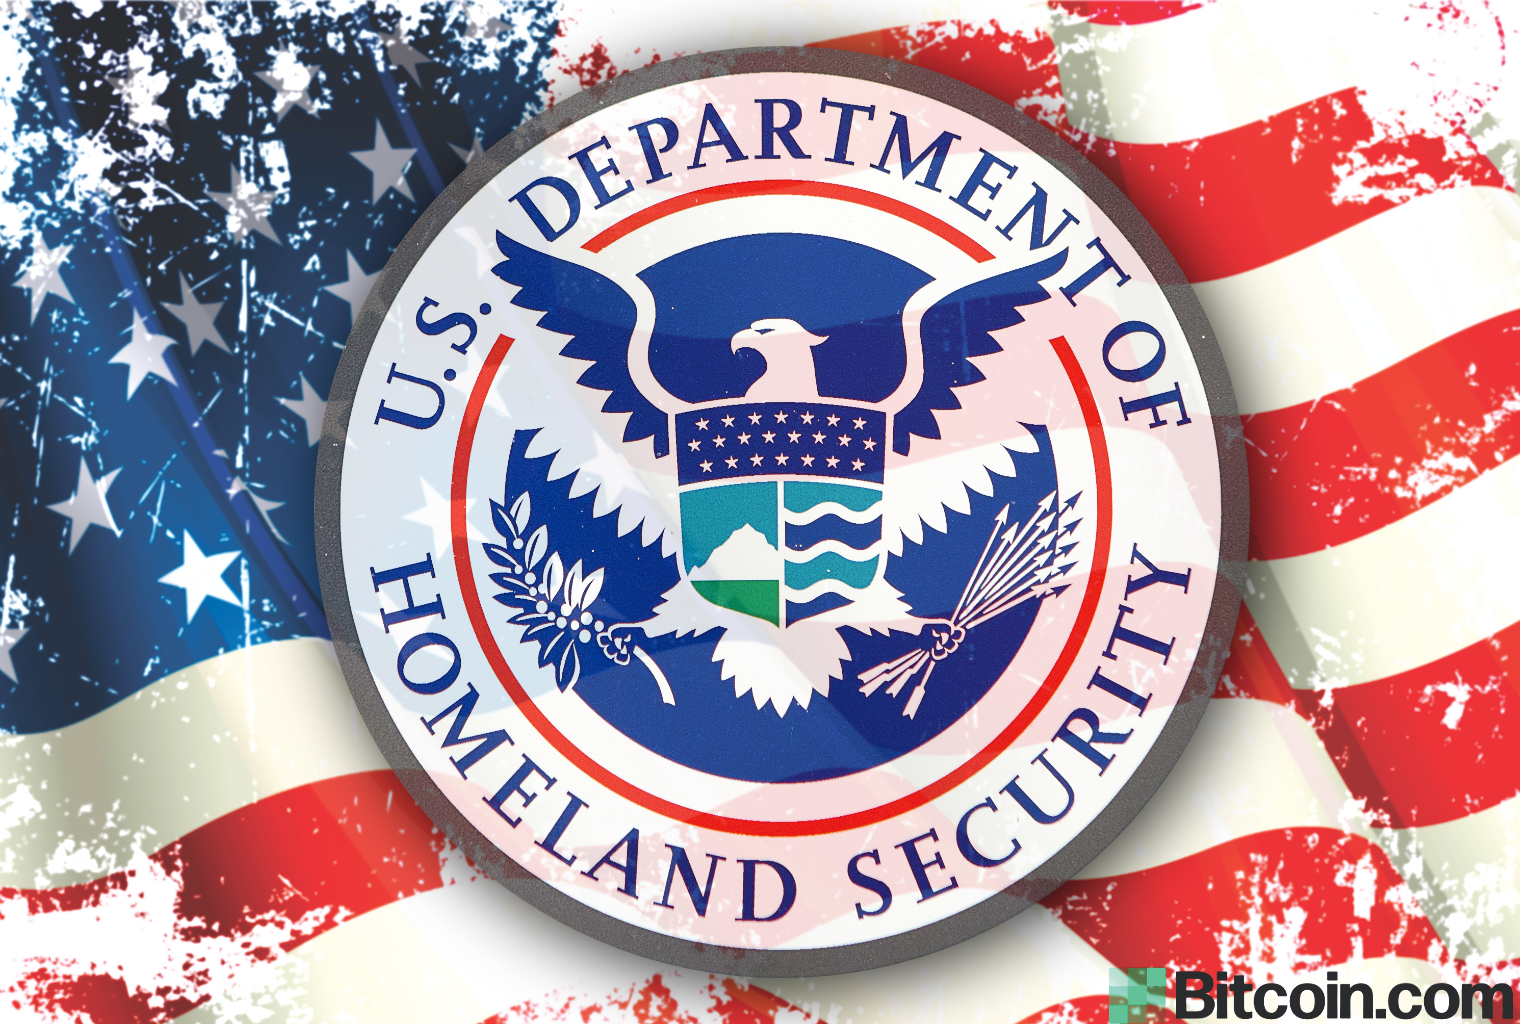 US Develops Cryptocurrency Intelligence Program Targeting P2P Sites, Forums, Darknet Markets